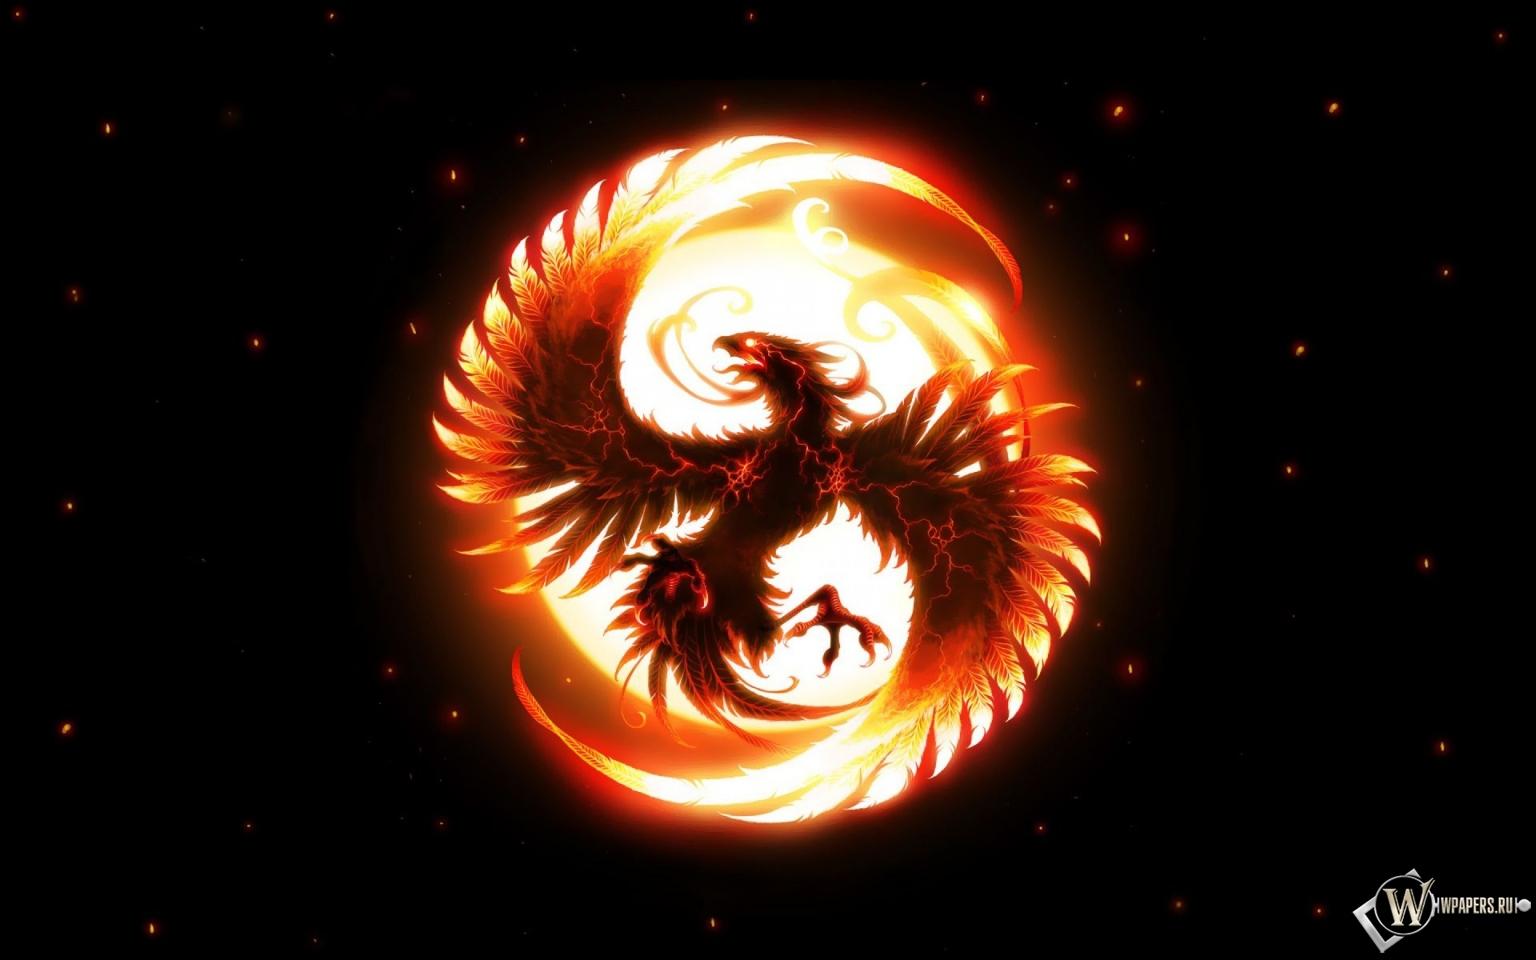 Phoenix 1536x960